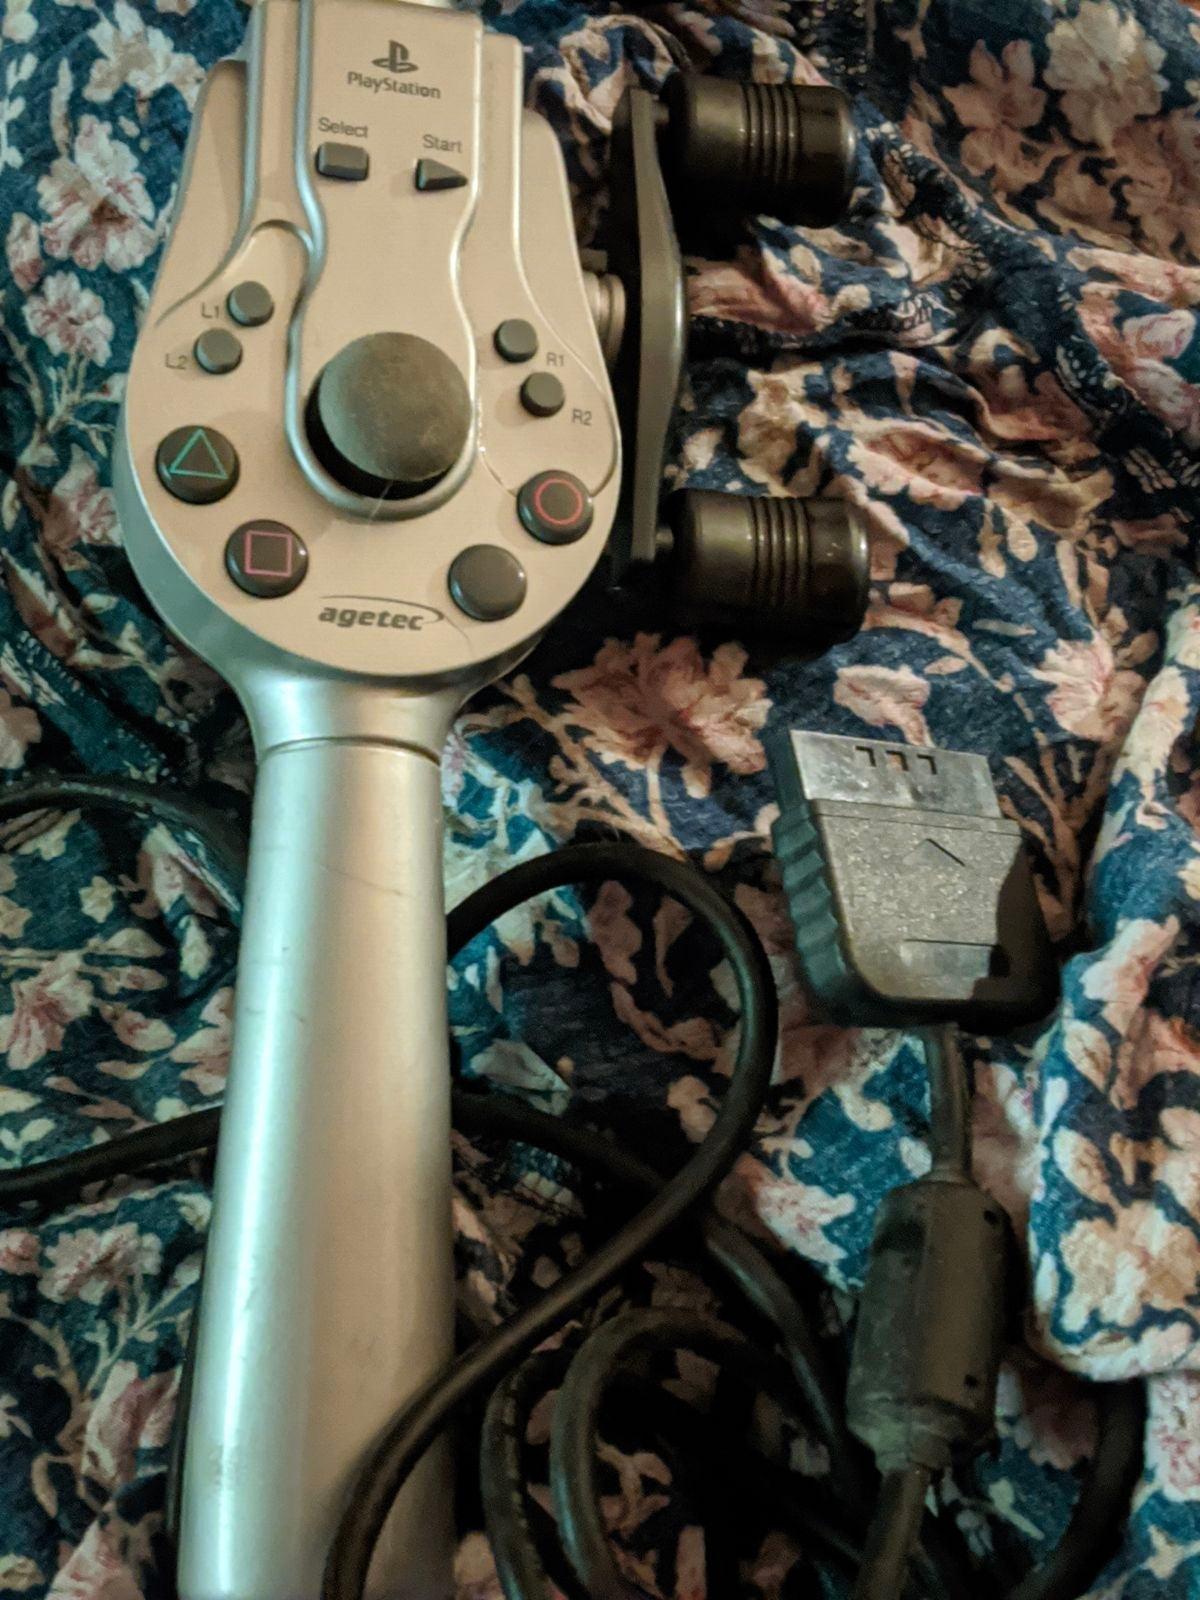 PS1/PS2 Agetec Fishing Controller - Rare